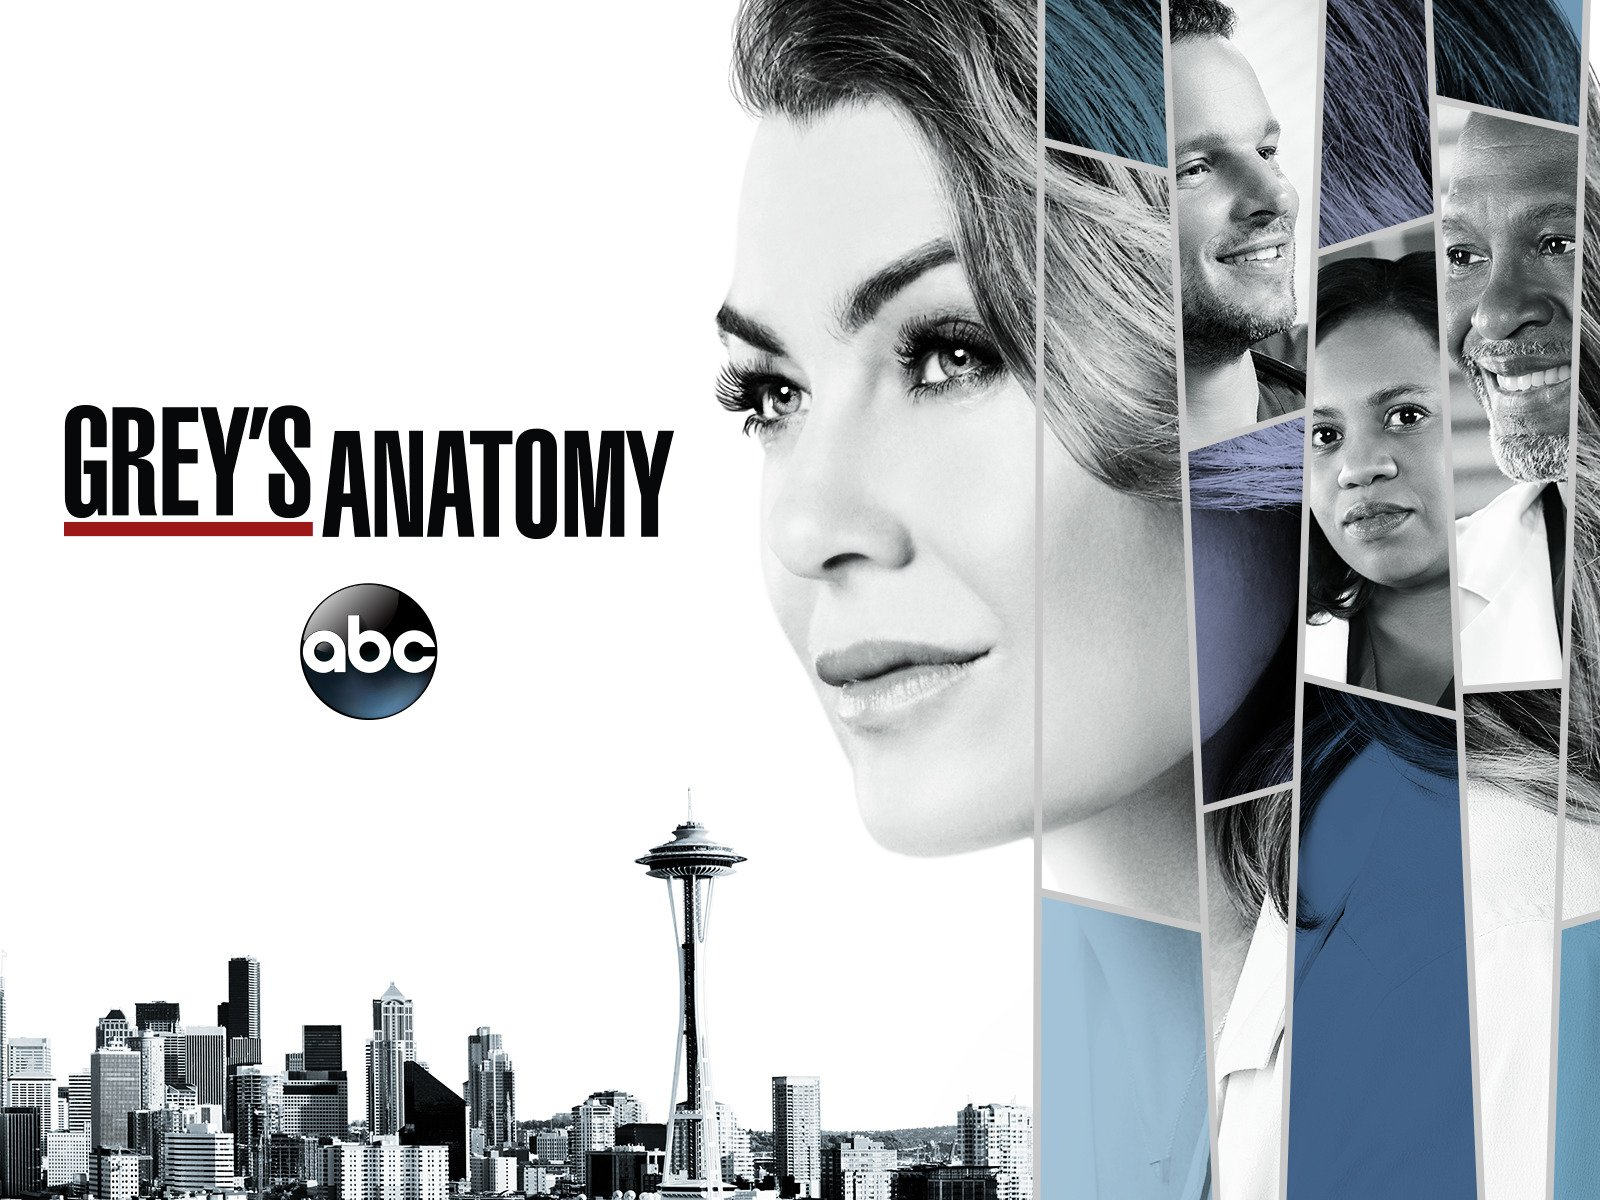 Grey's Anatomy étoiles datant dans la vraie vie